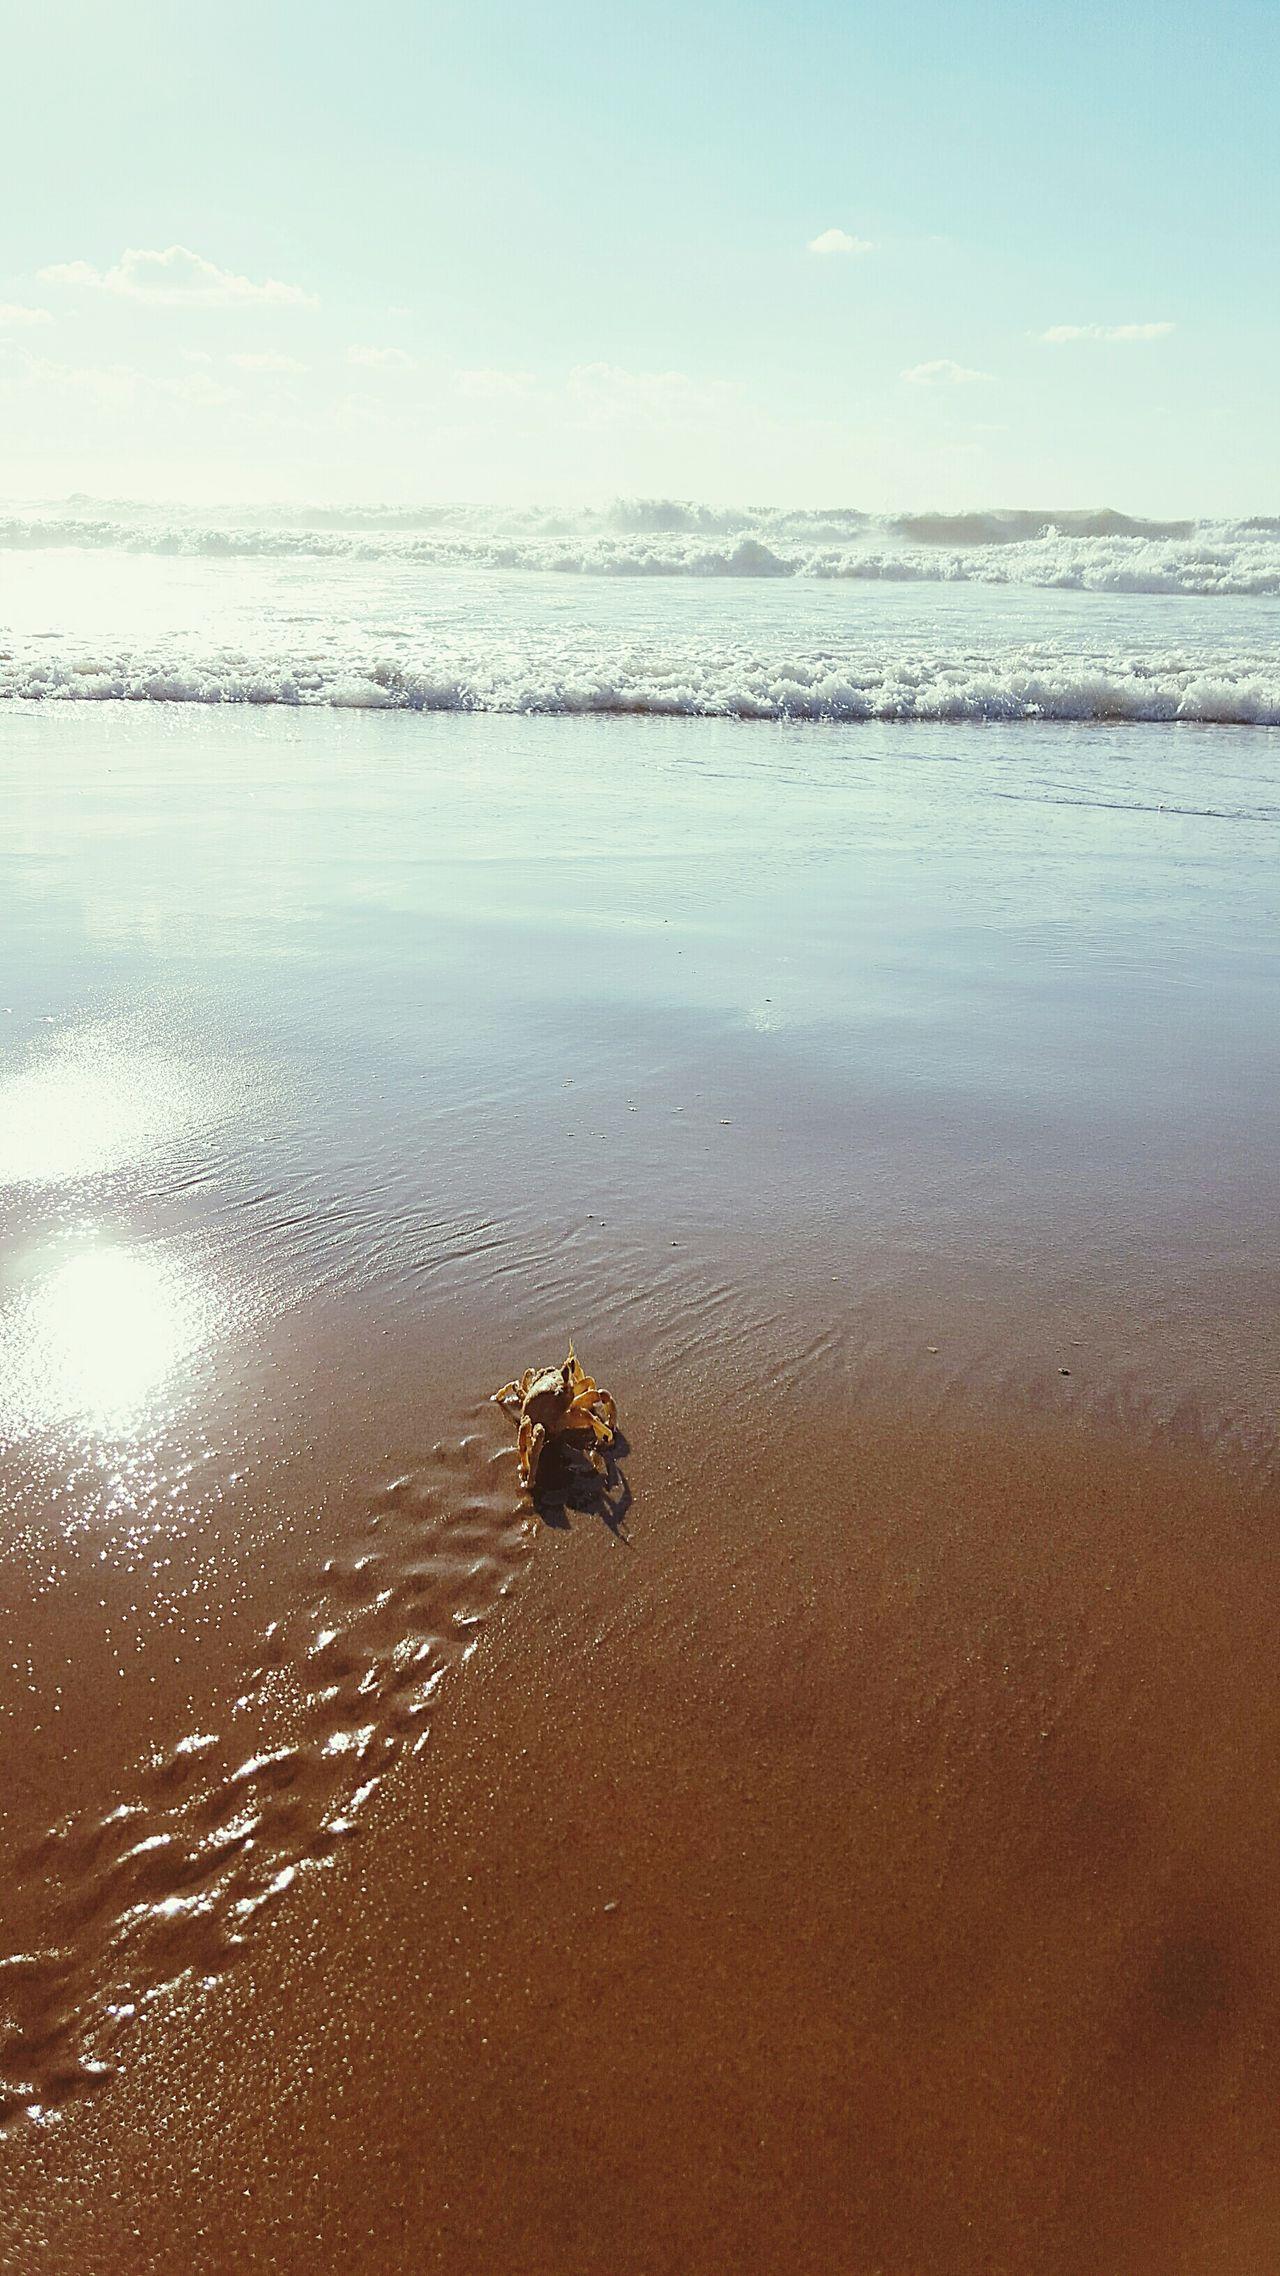 Showcase: January January2016 Mediterranean  Sand Sea Sun Waves Crab Kámoš Nature The Week Of Eyeem EyeEm Best Shots The Great Outdoors - 2016 EyeEm Awards The Great Outdoors With Adobe